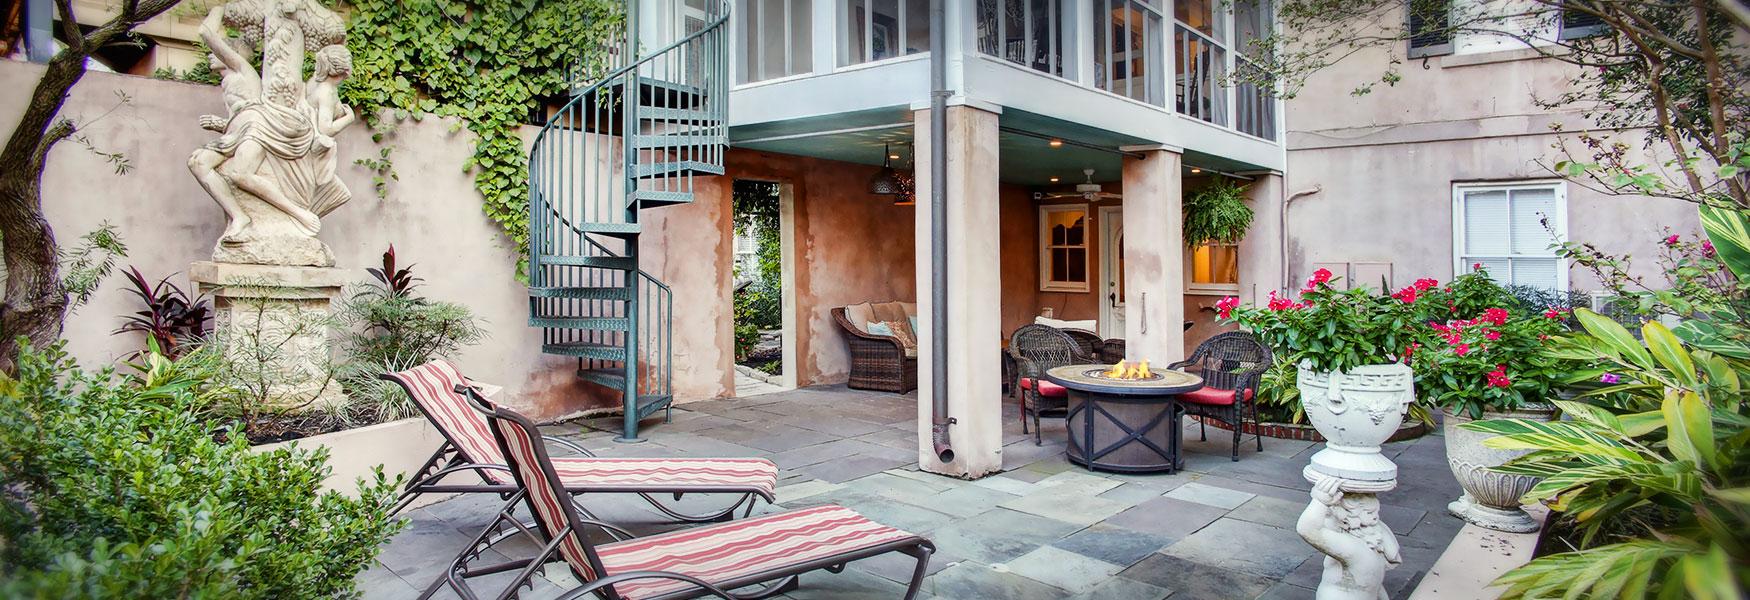 courtyard at McMillan Inn